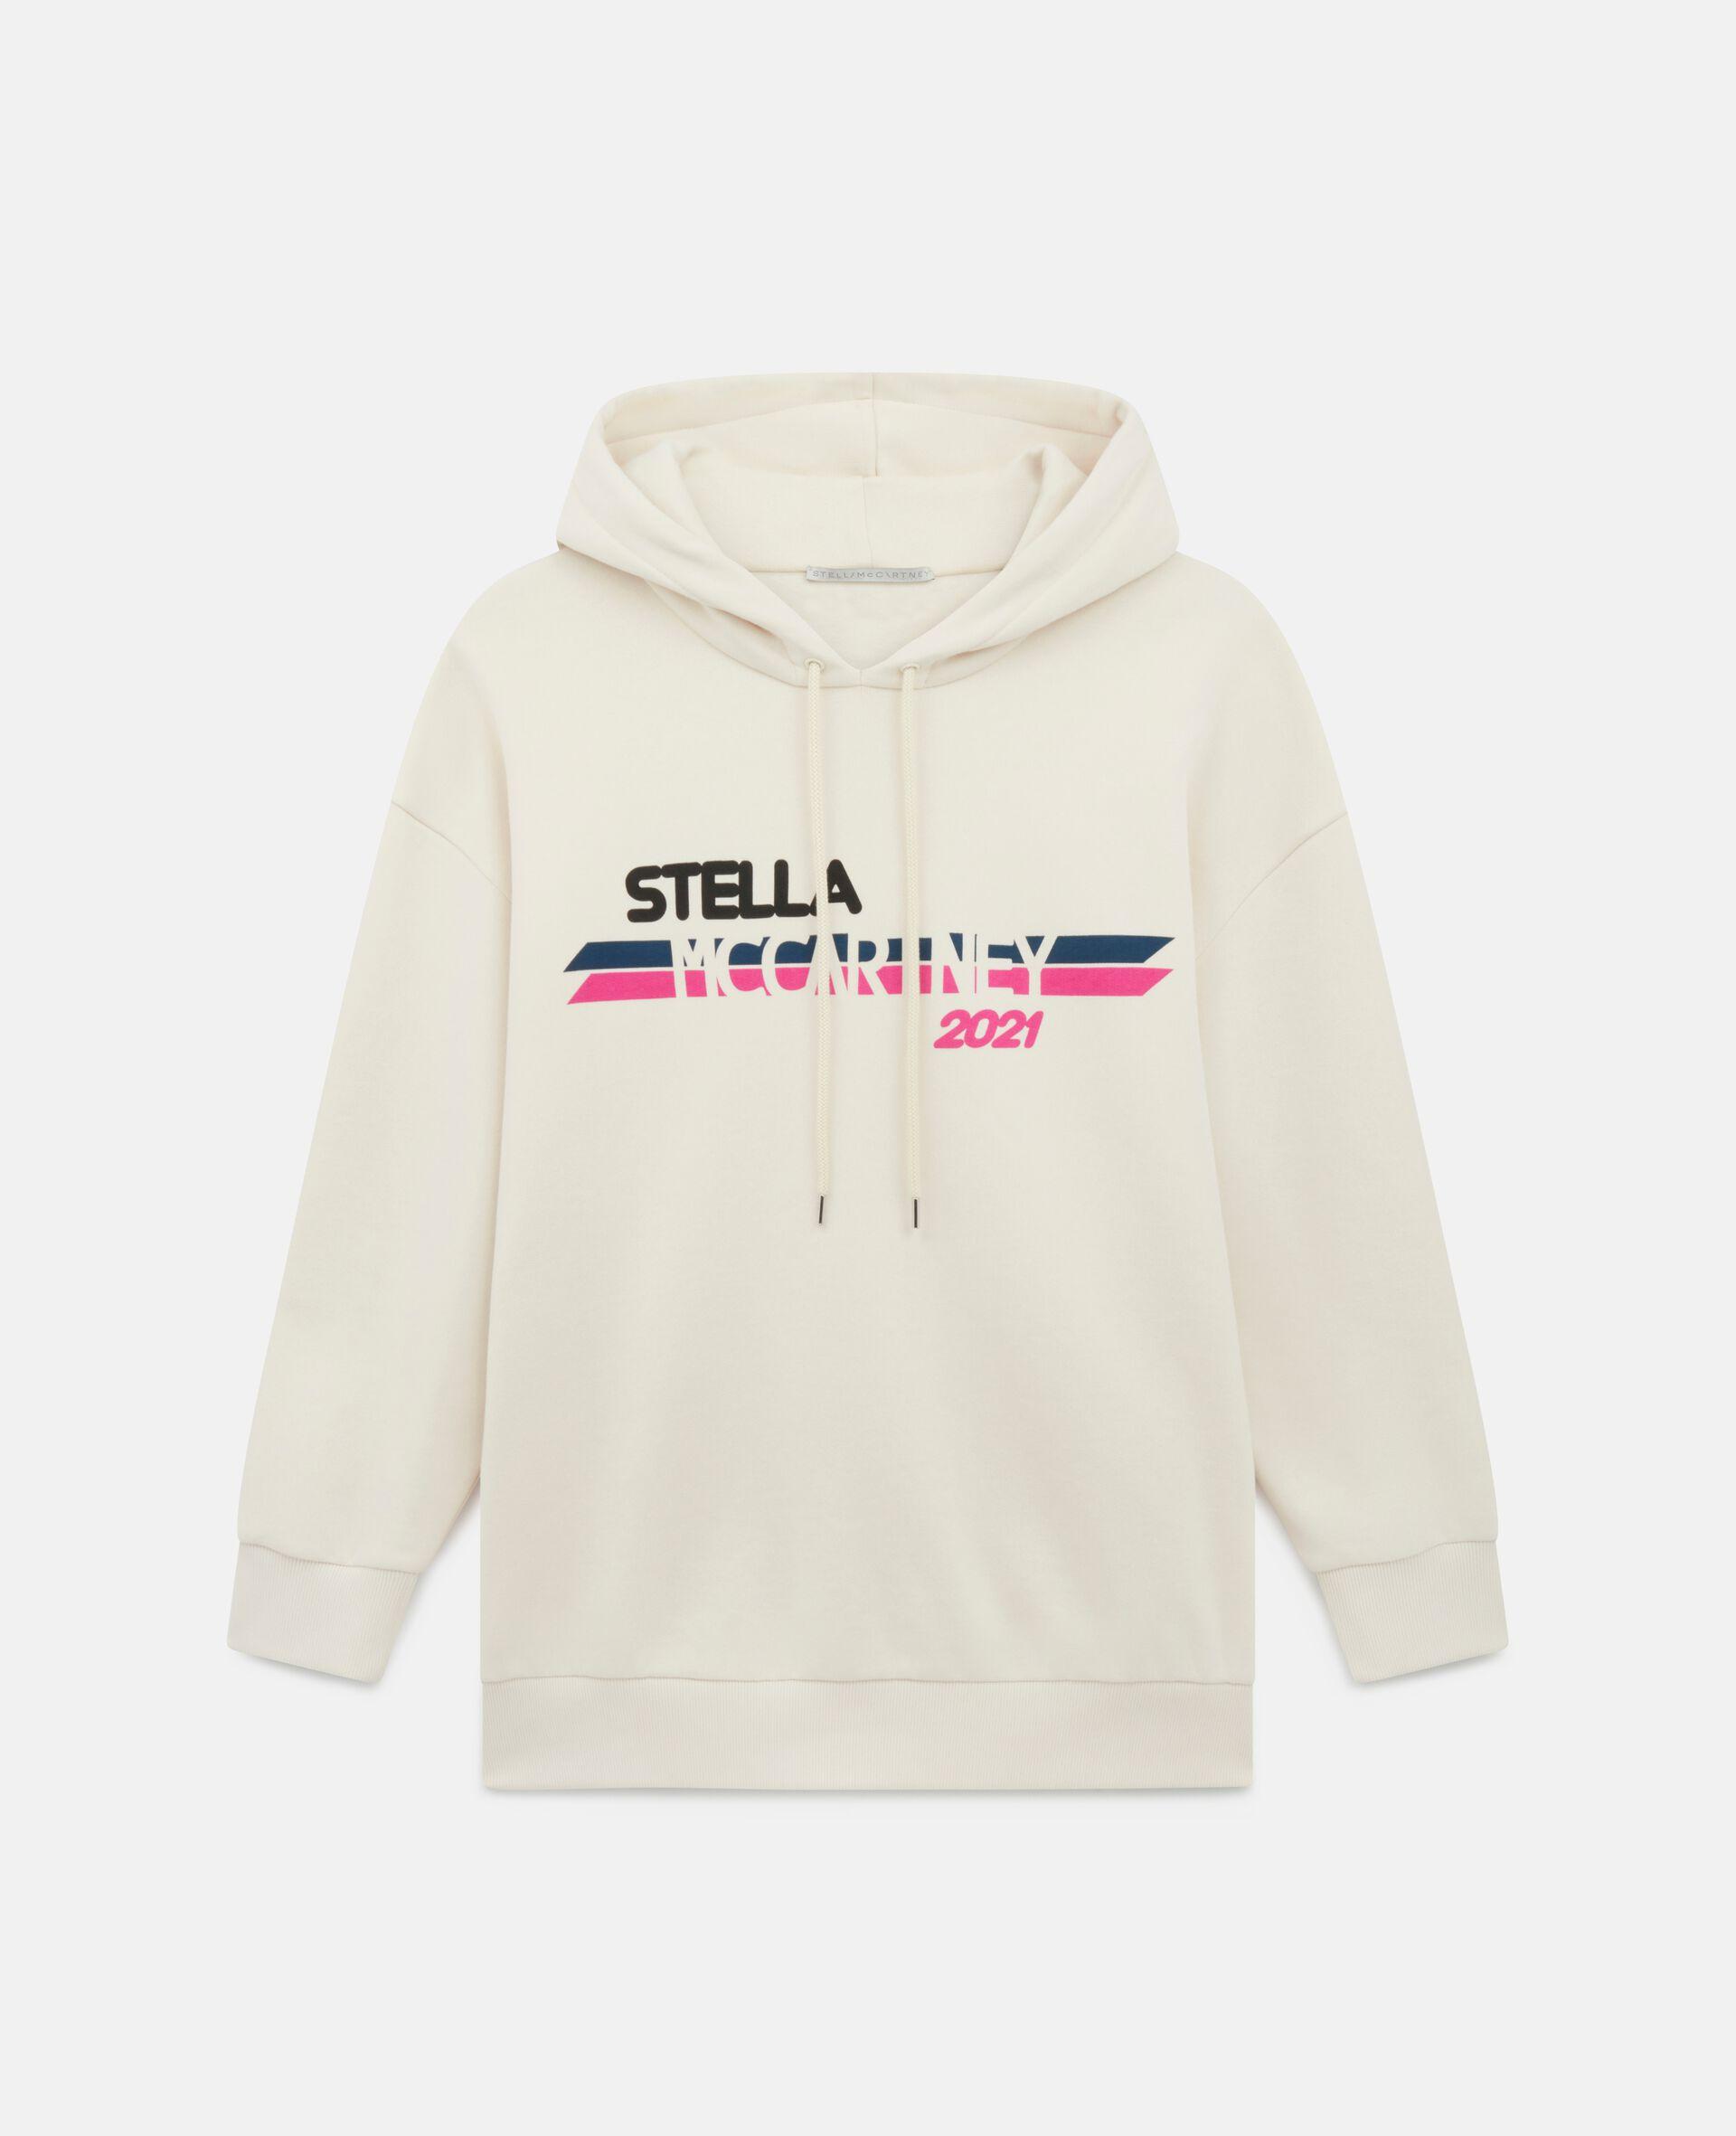 Sweat-shirt à capuche à logo Stella McCartney2021-Blanc-large image number 0